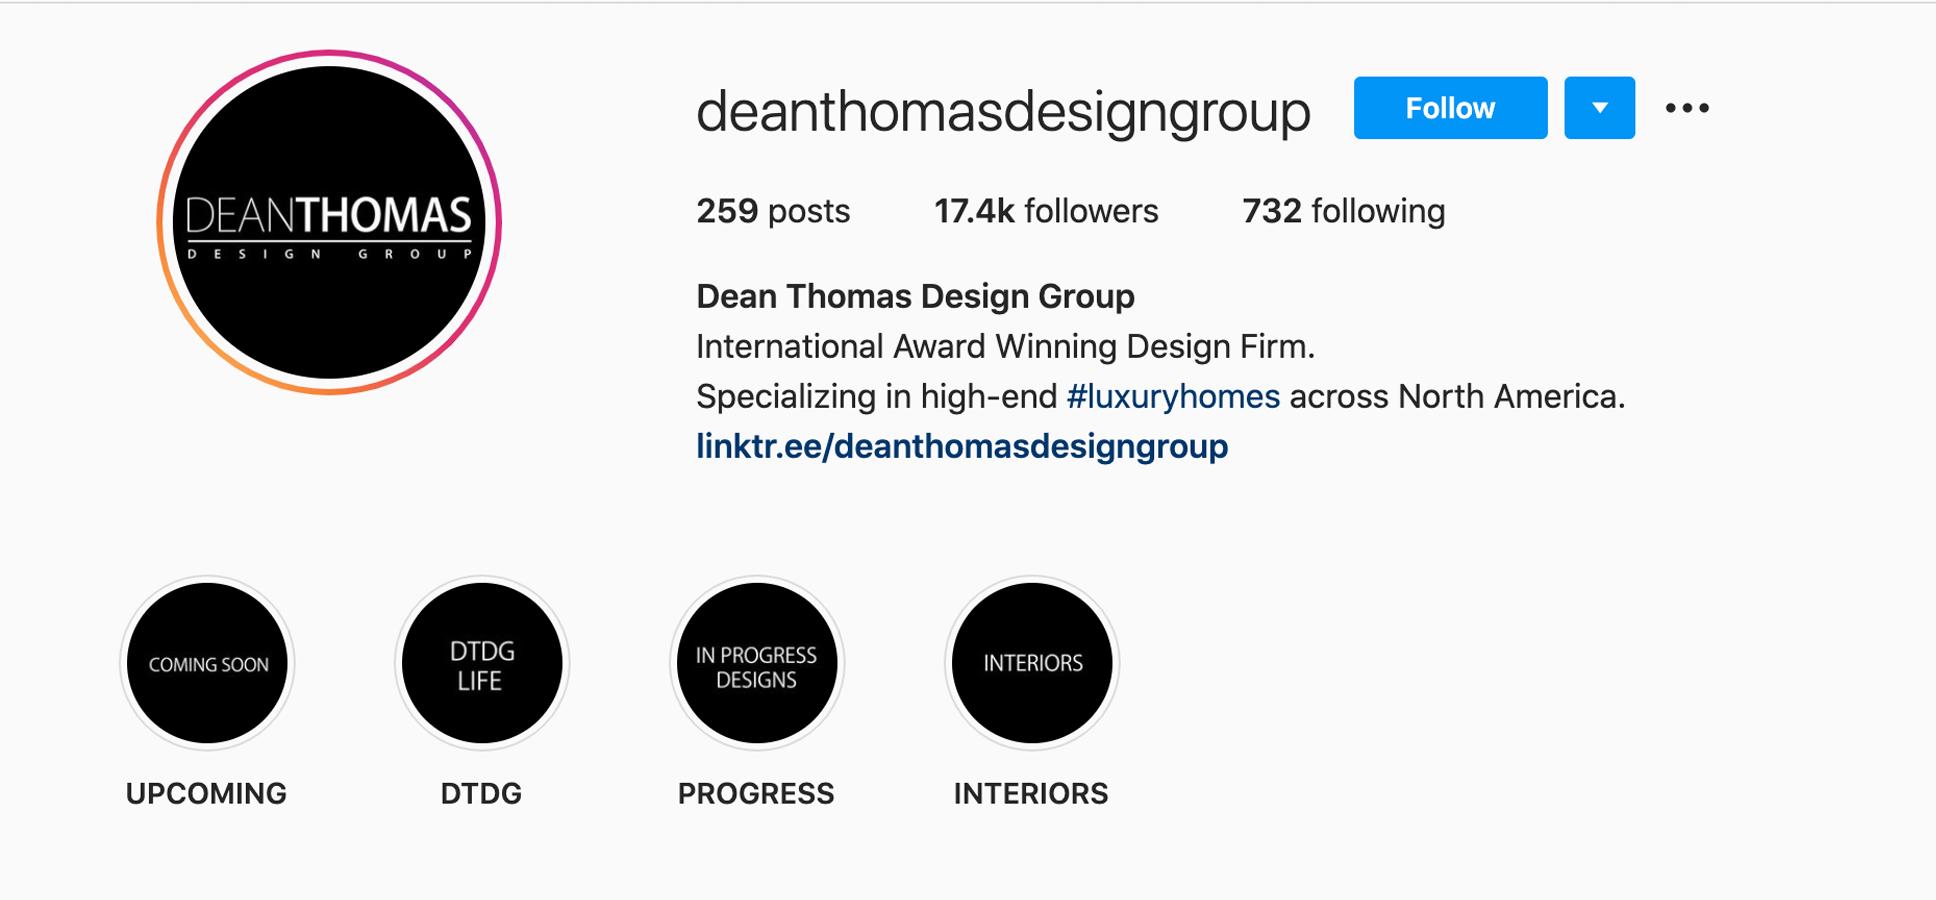 deanthomasdesigngroup-instagram-profile